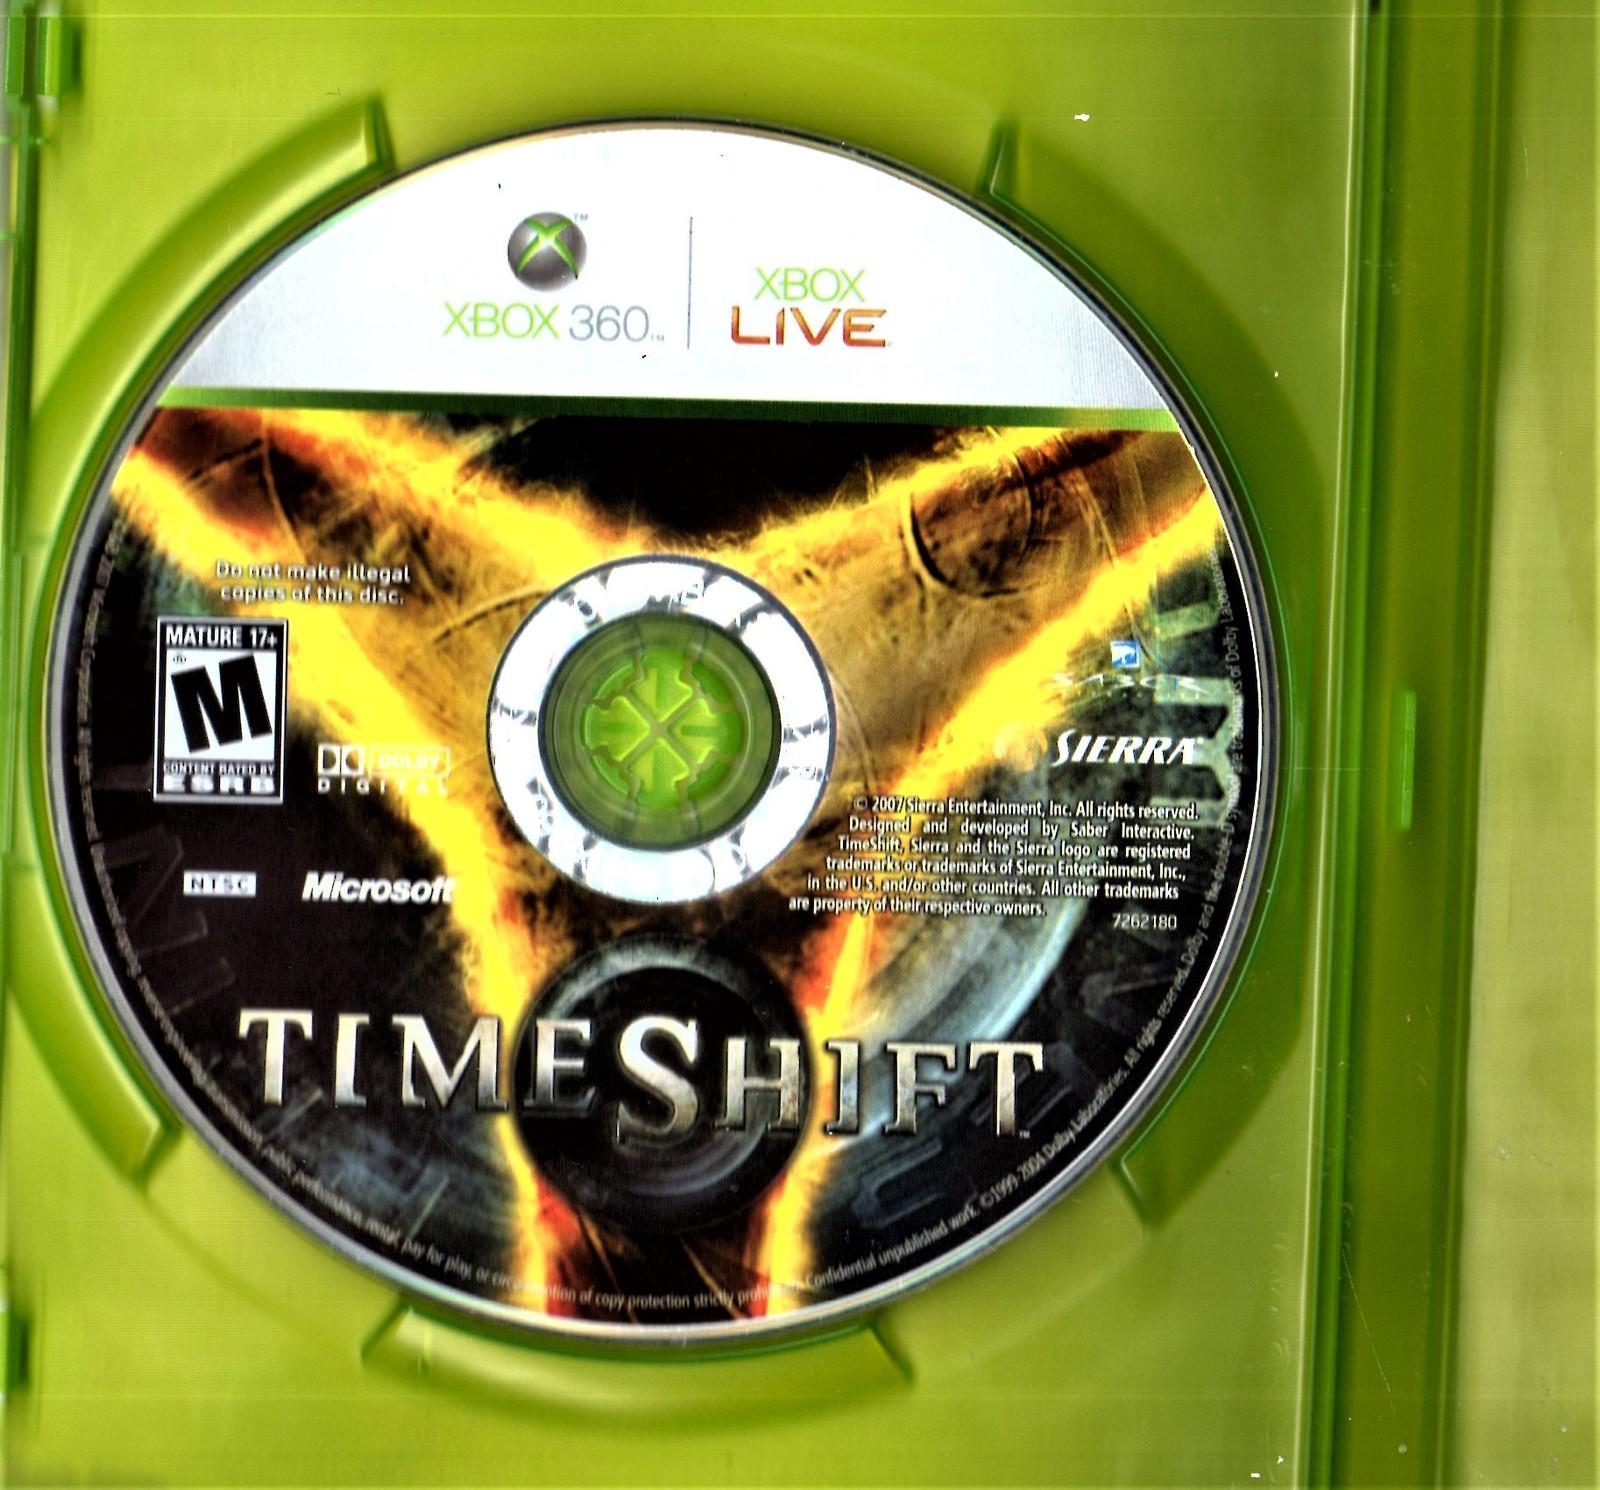 XBox 360 - TIME SHIFT